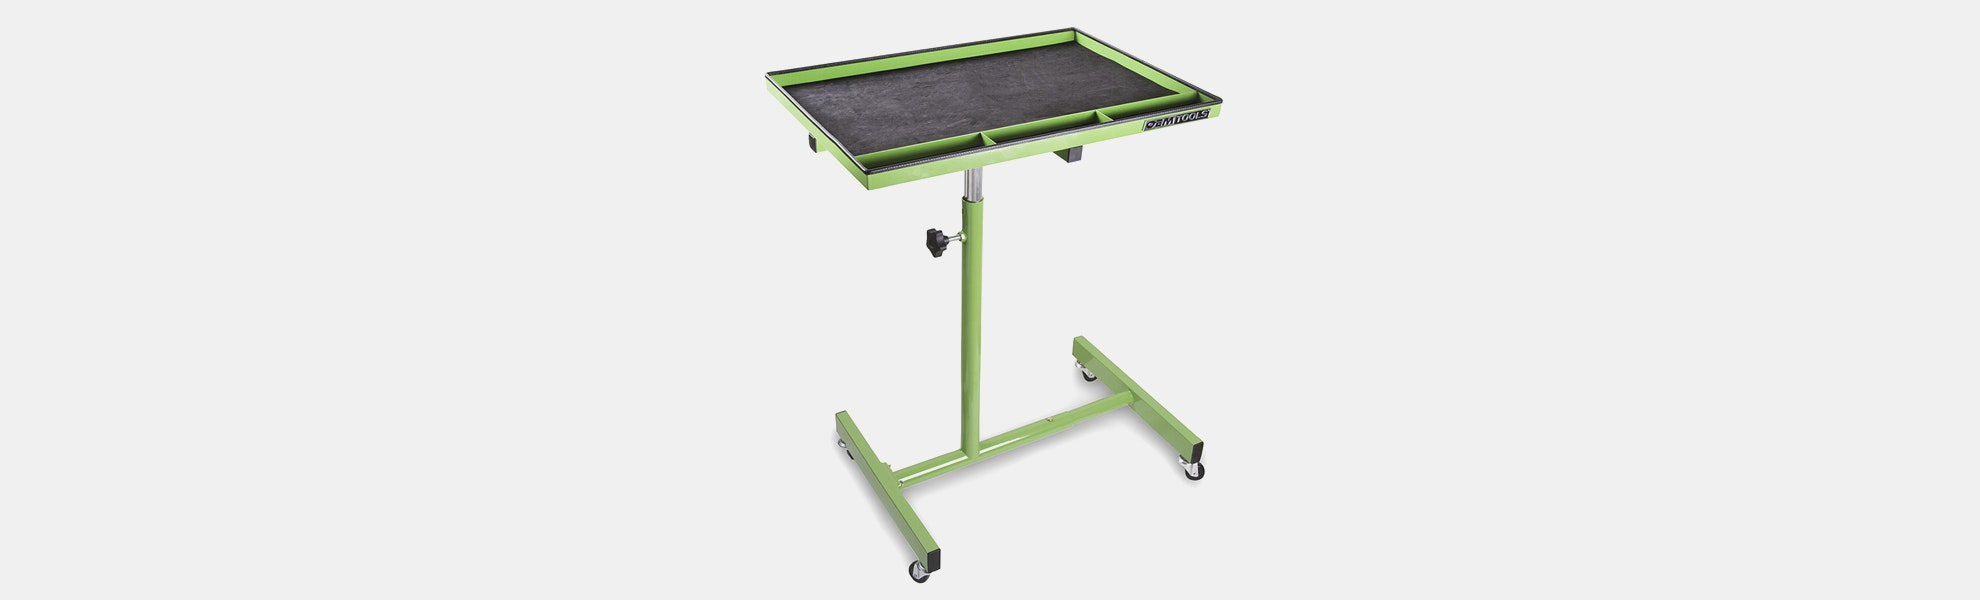 OEM Tools Portable Tear-Down Tray